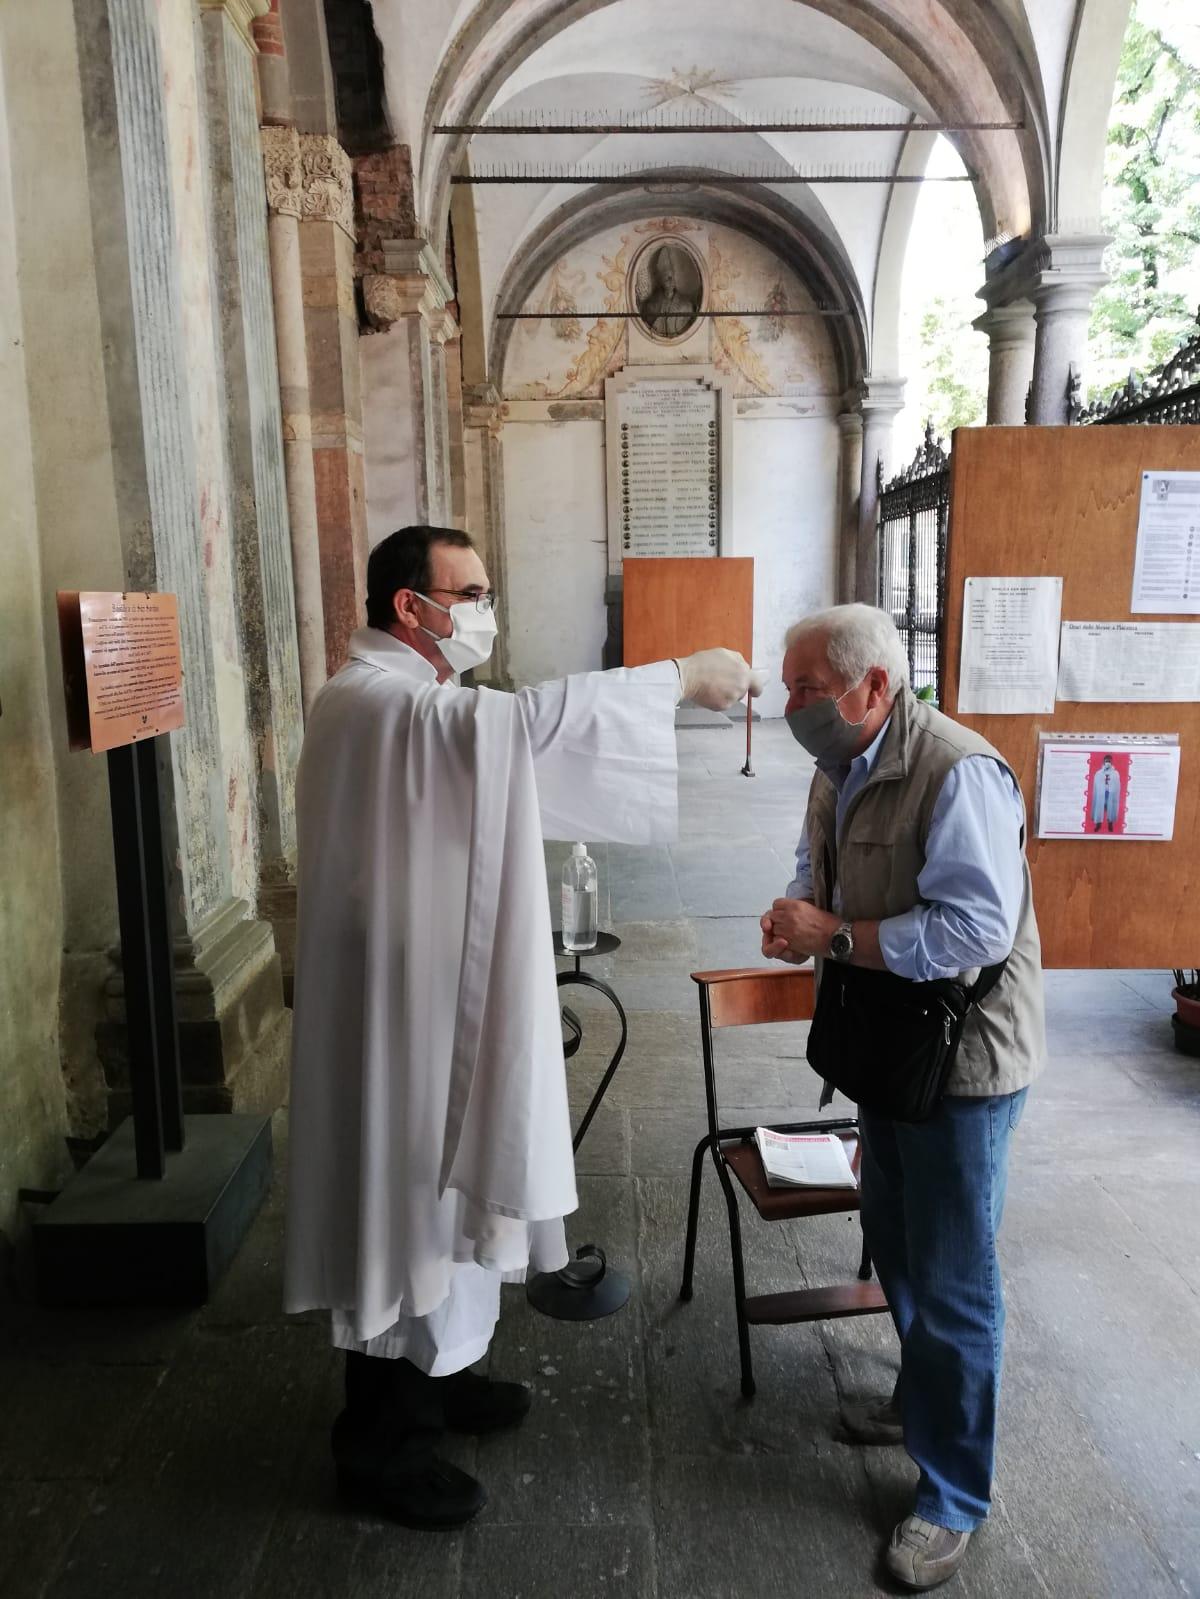 Custodia e S. Messa chiesa S. Savino a Piacenza (PC)